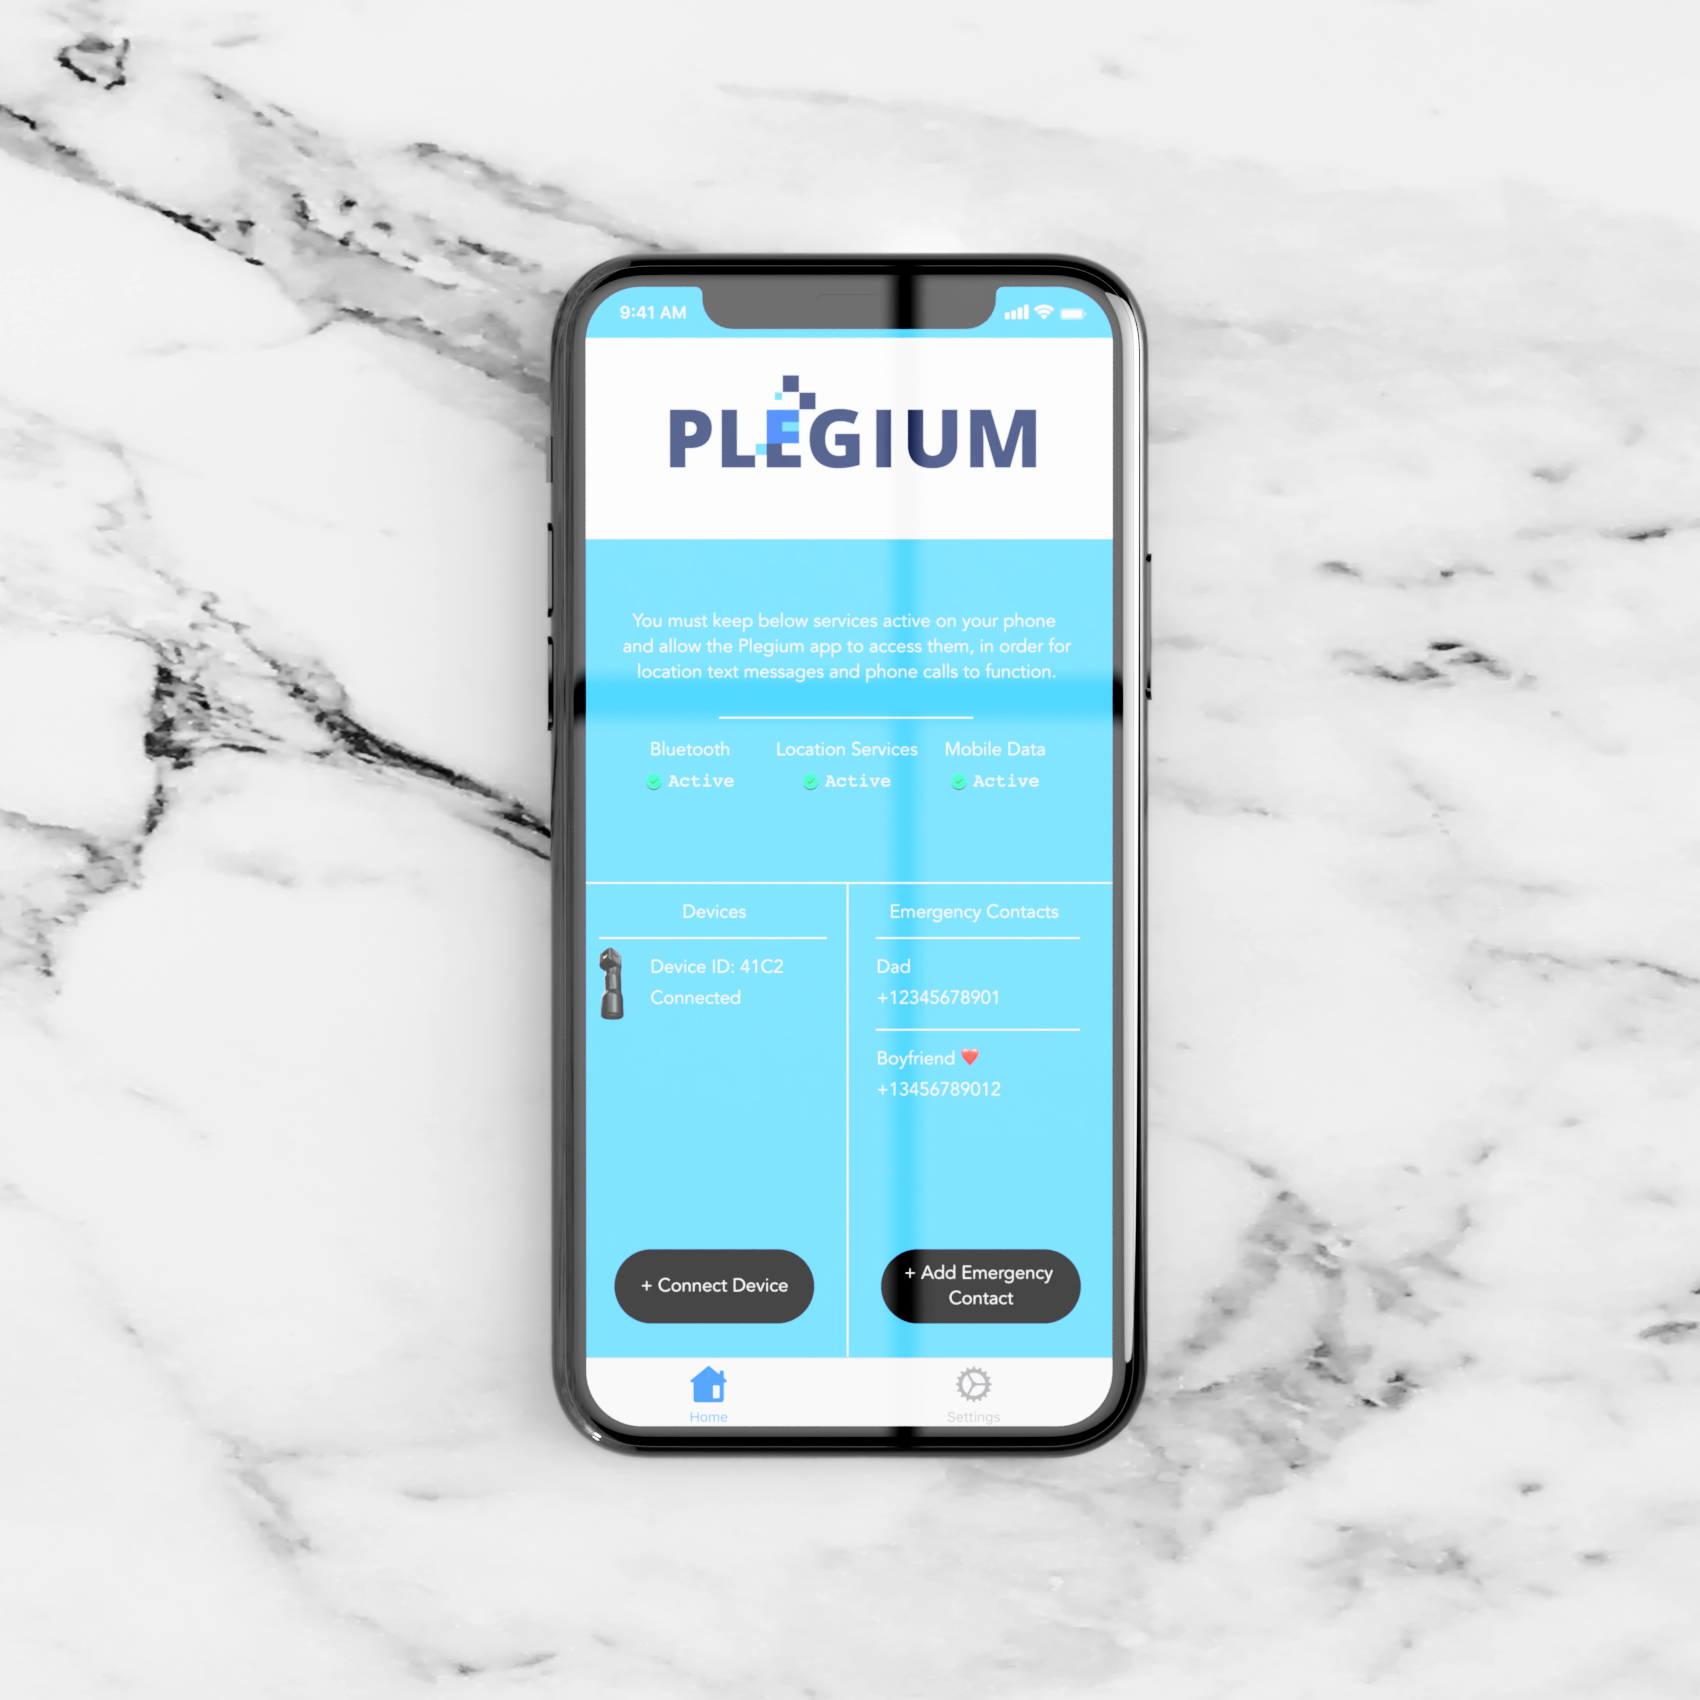 Iphone med Plegium-appen öppen